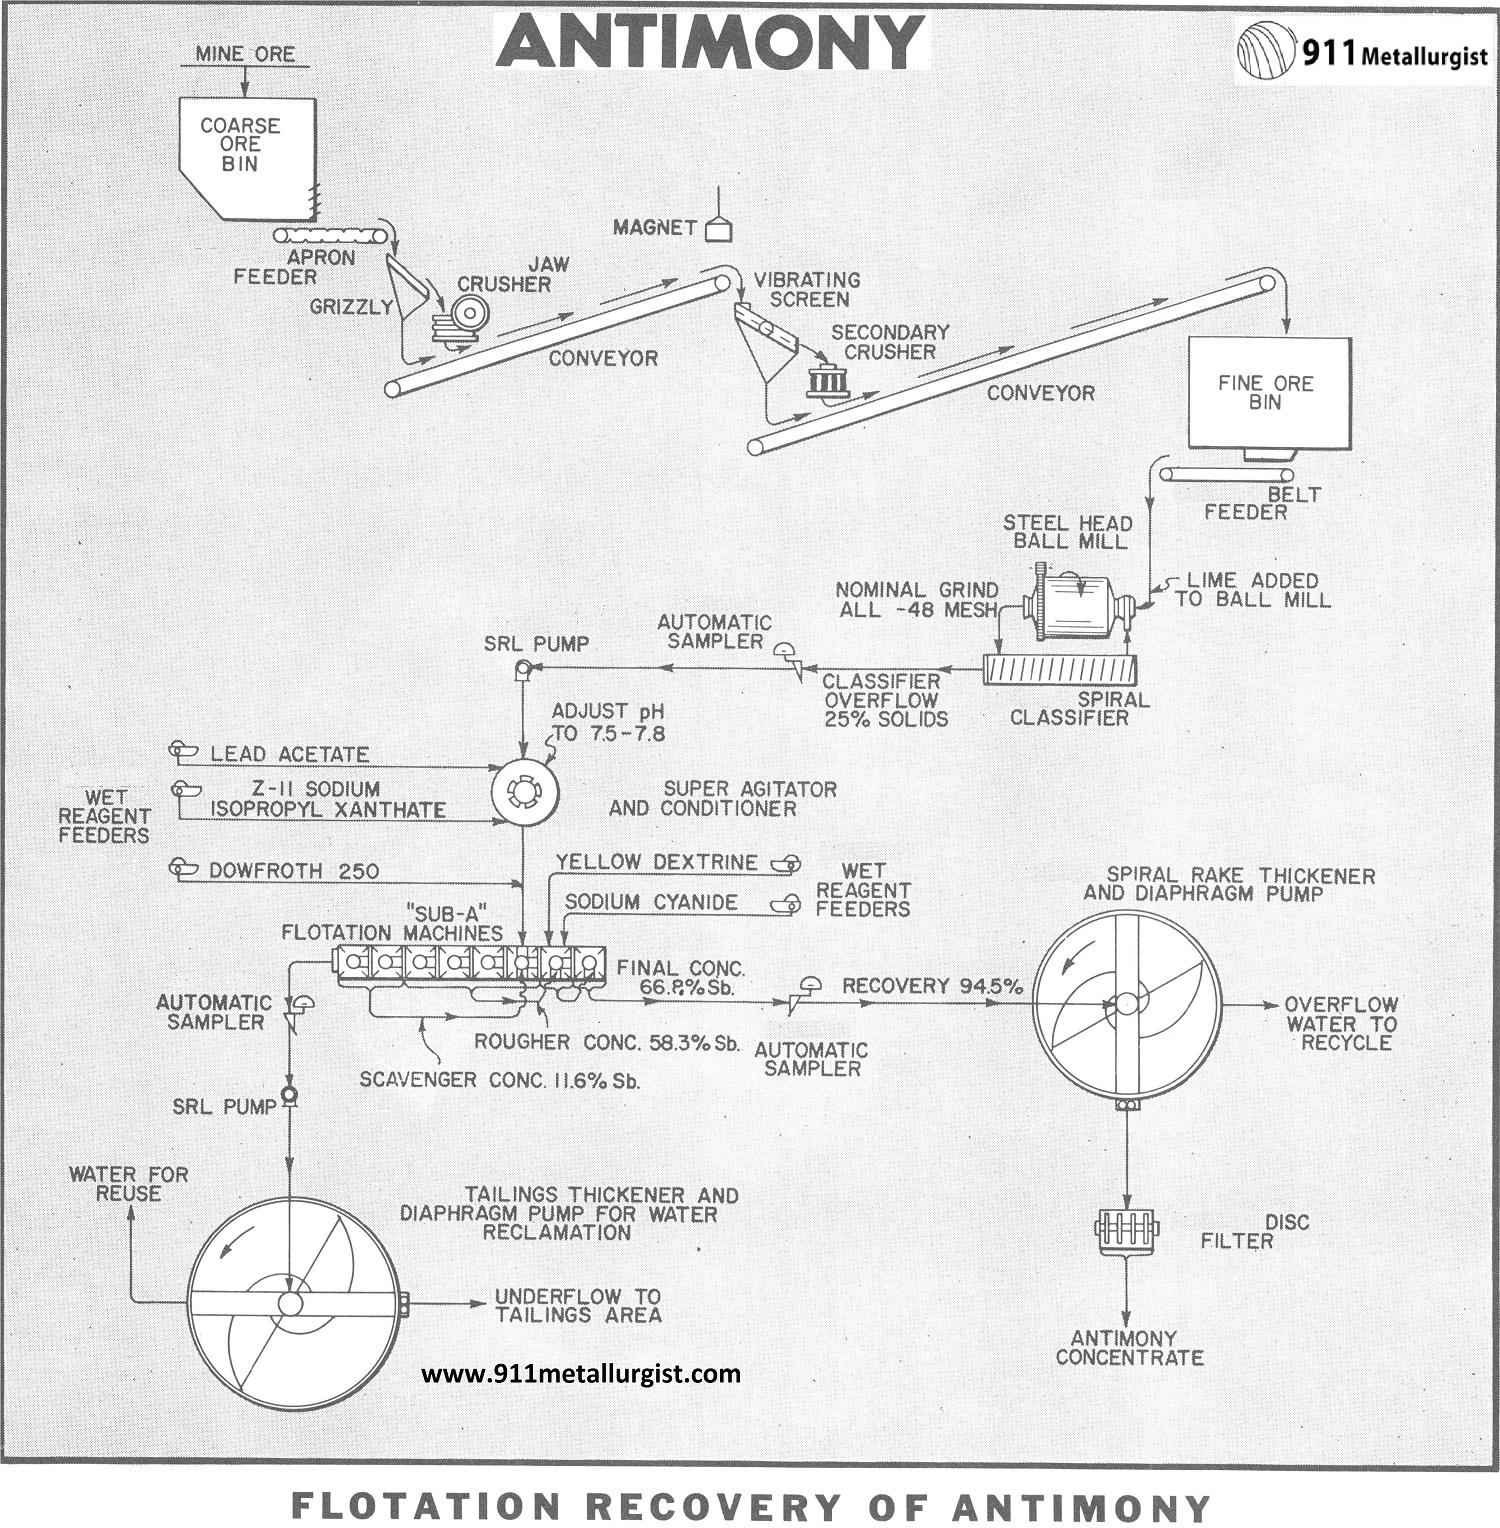 Flotation Recovery of Antimony